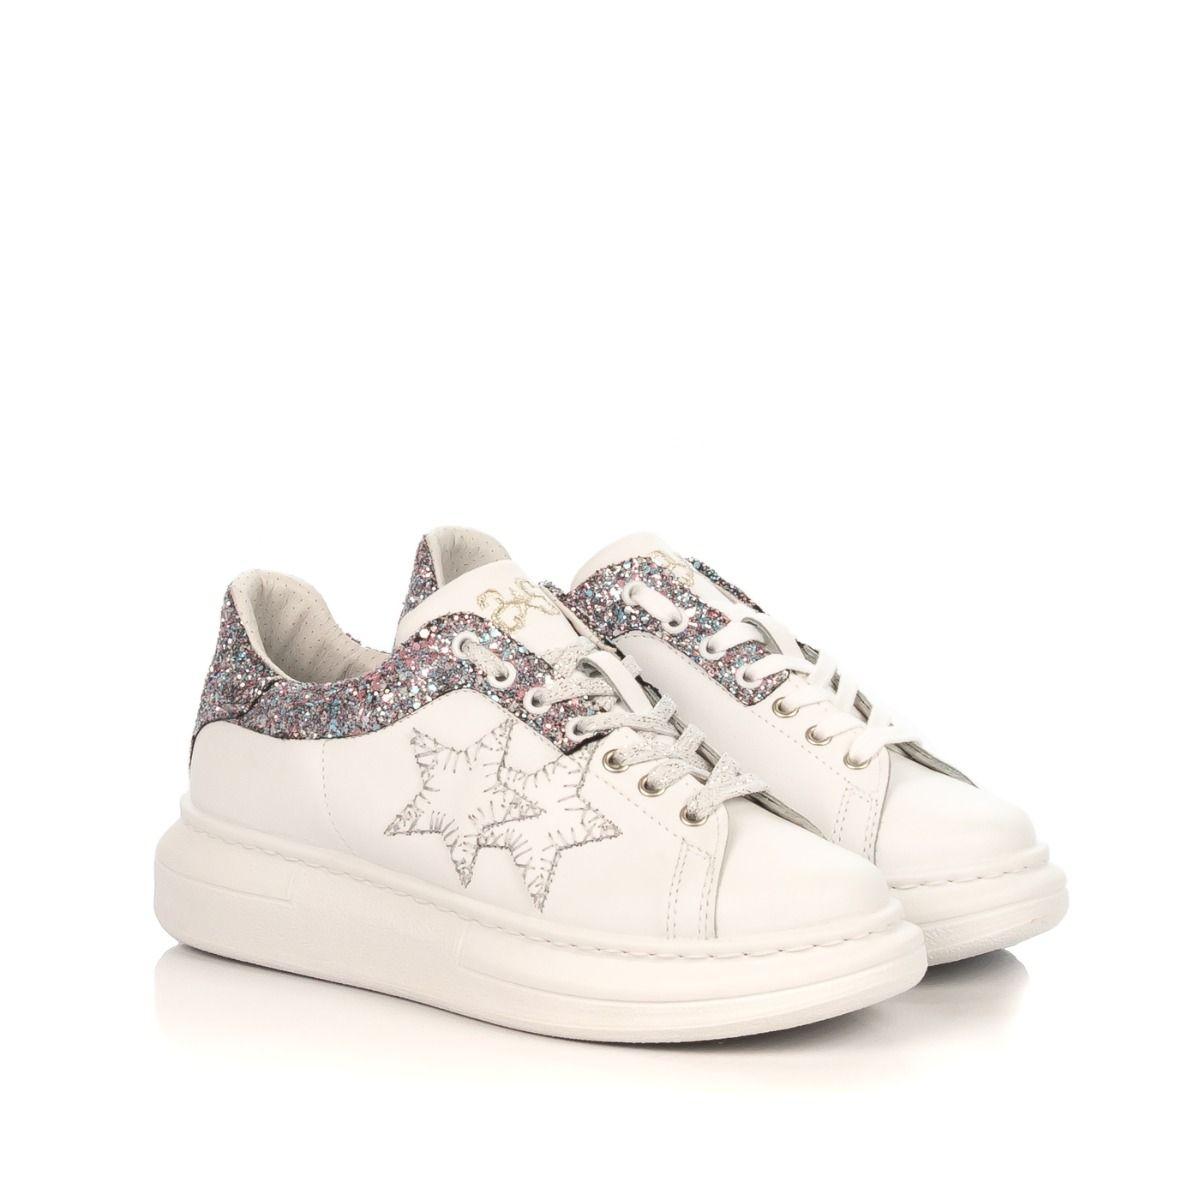 Sneakers Donna Glitter 2star Bianco Platform 2sd2262 BdotrxshQC